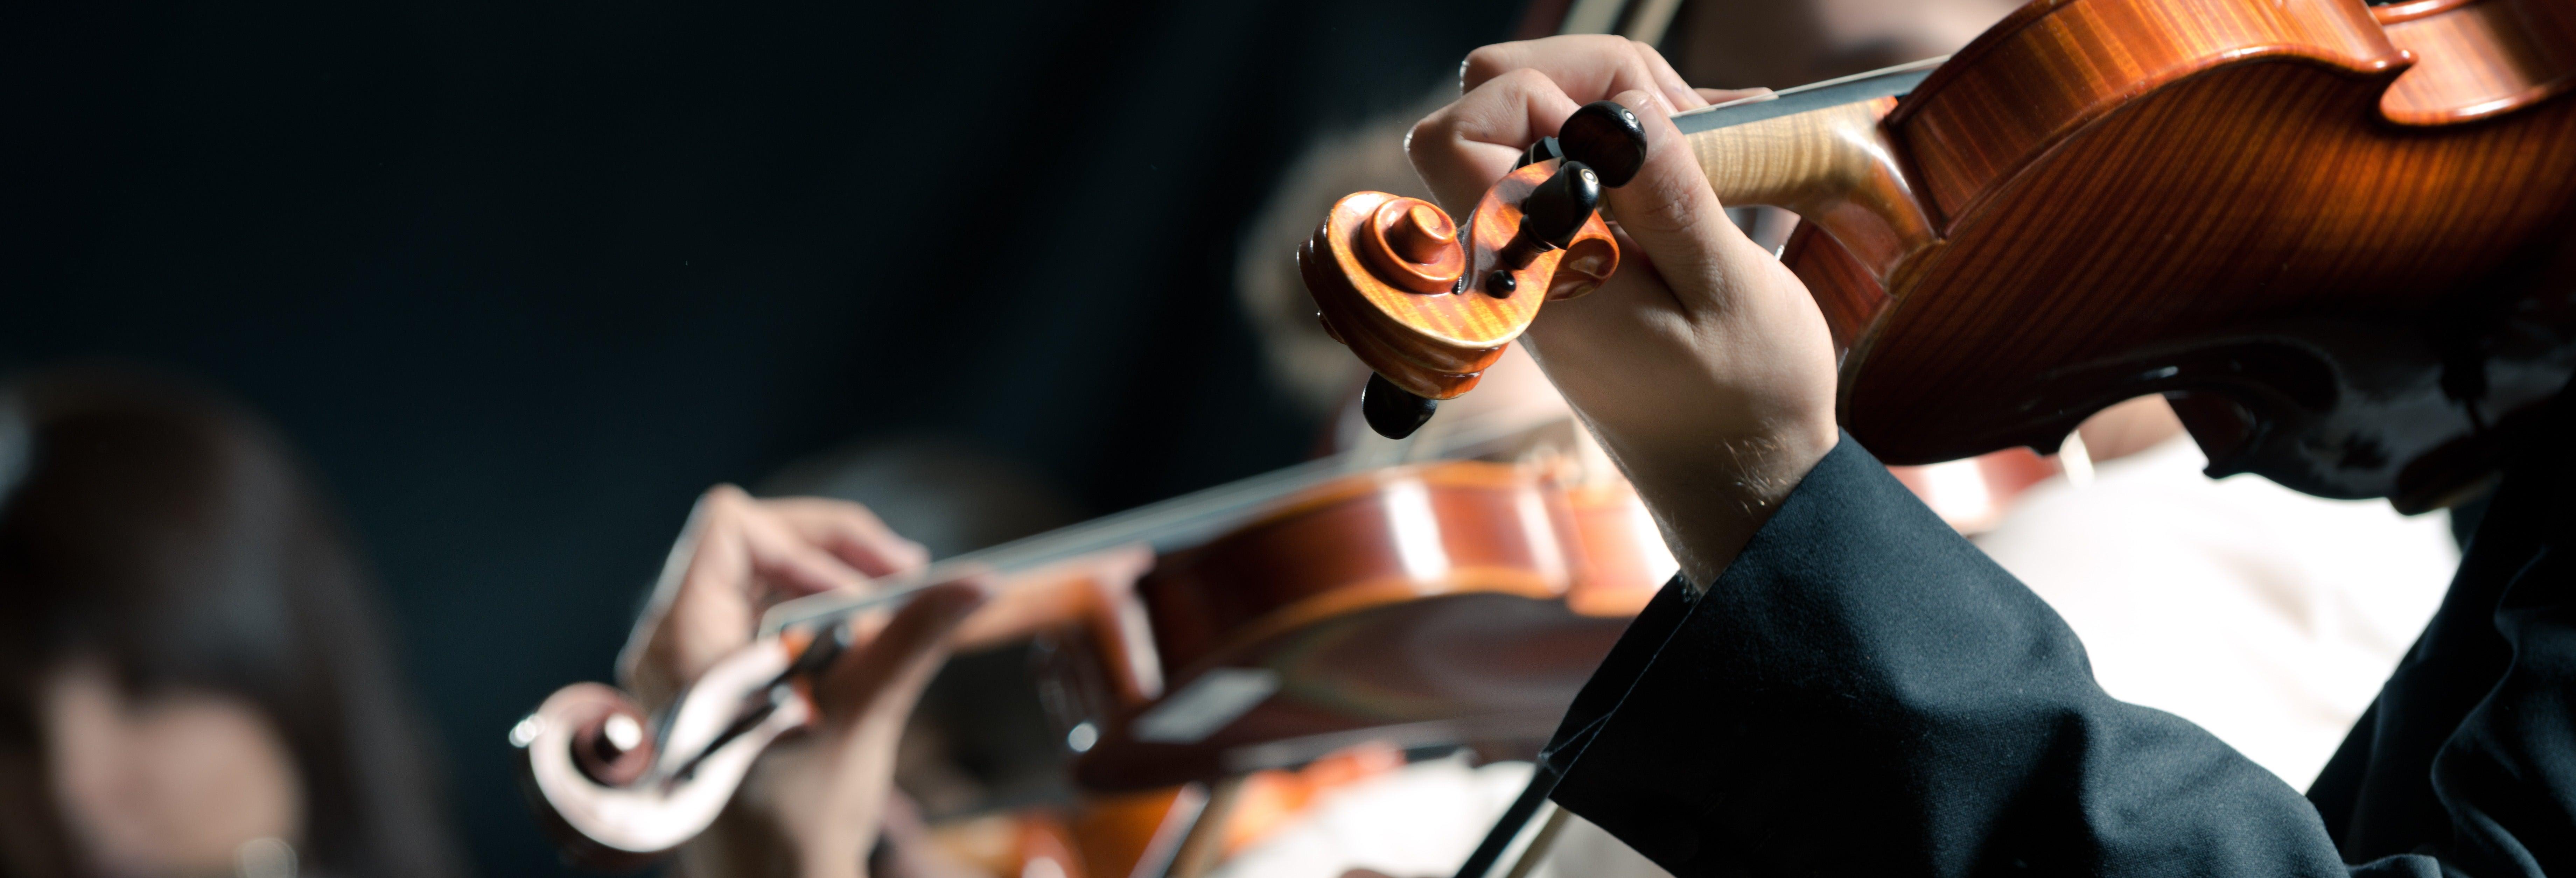 Concierto de música clásica en Saint-Germain-des-Prés